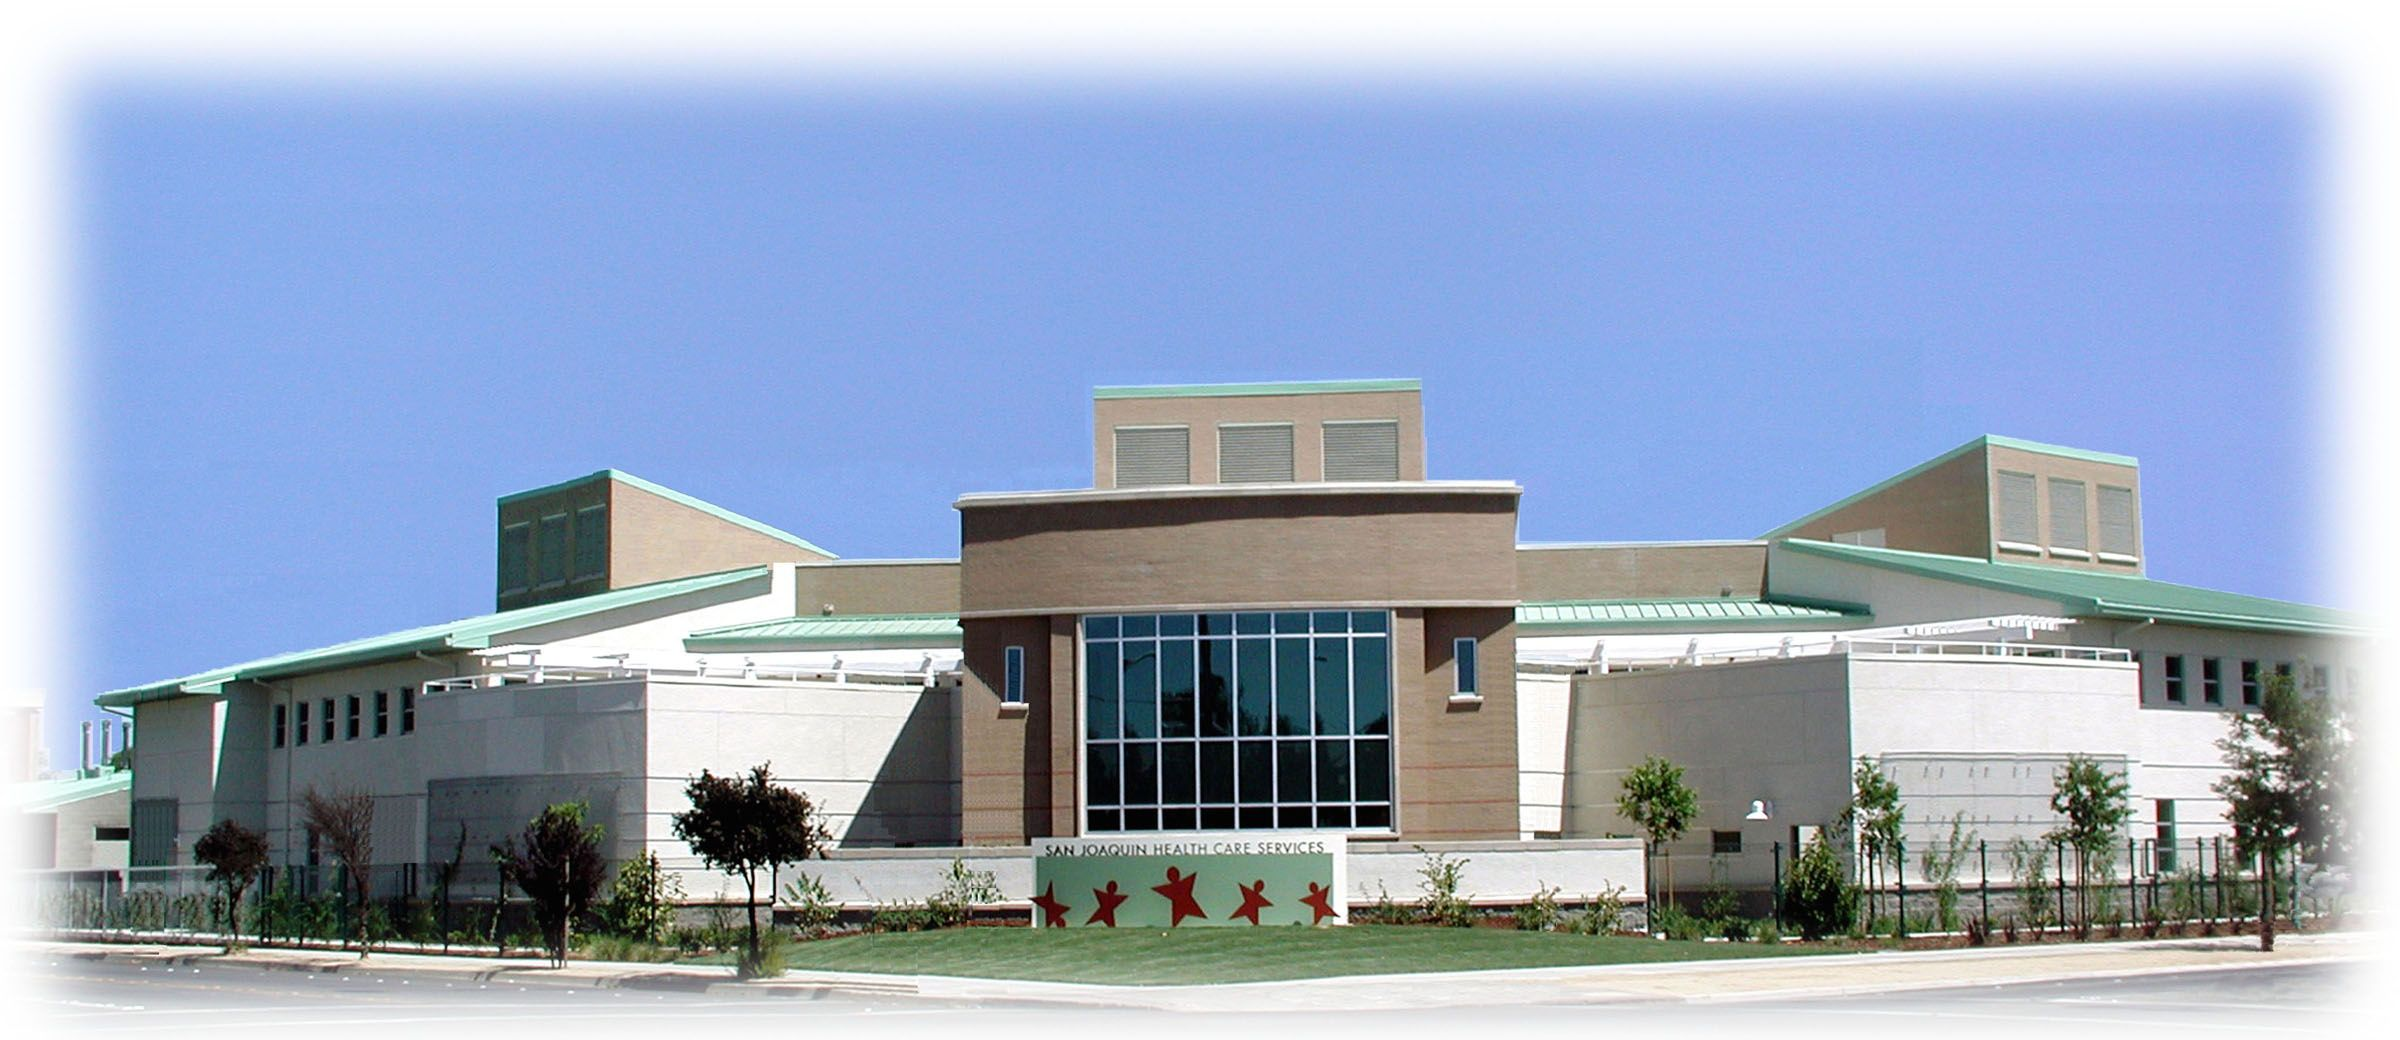 5th Street Medical Clinic